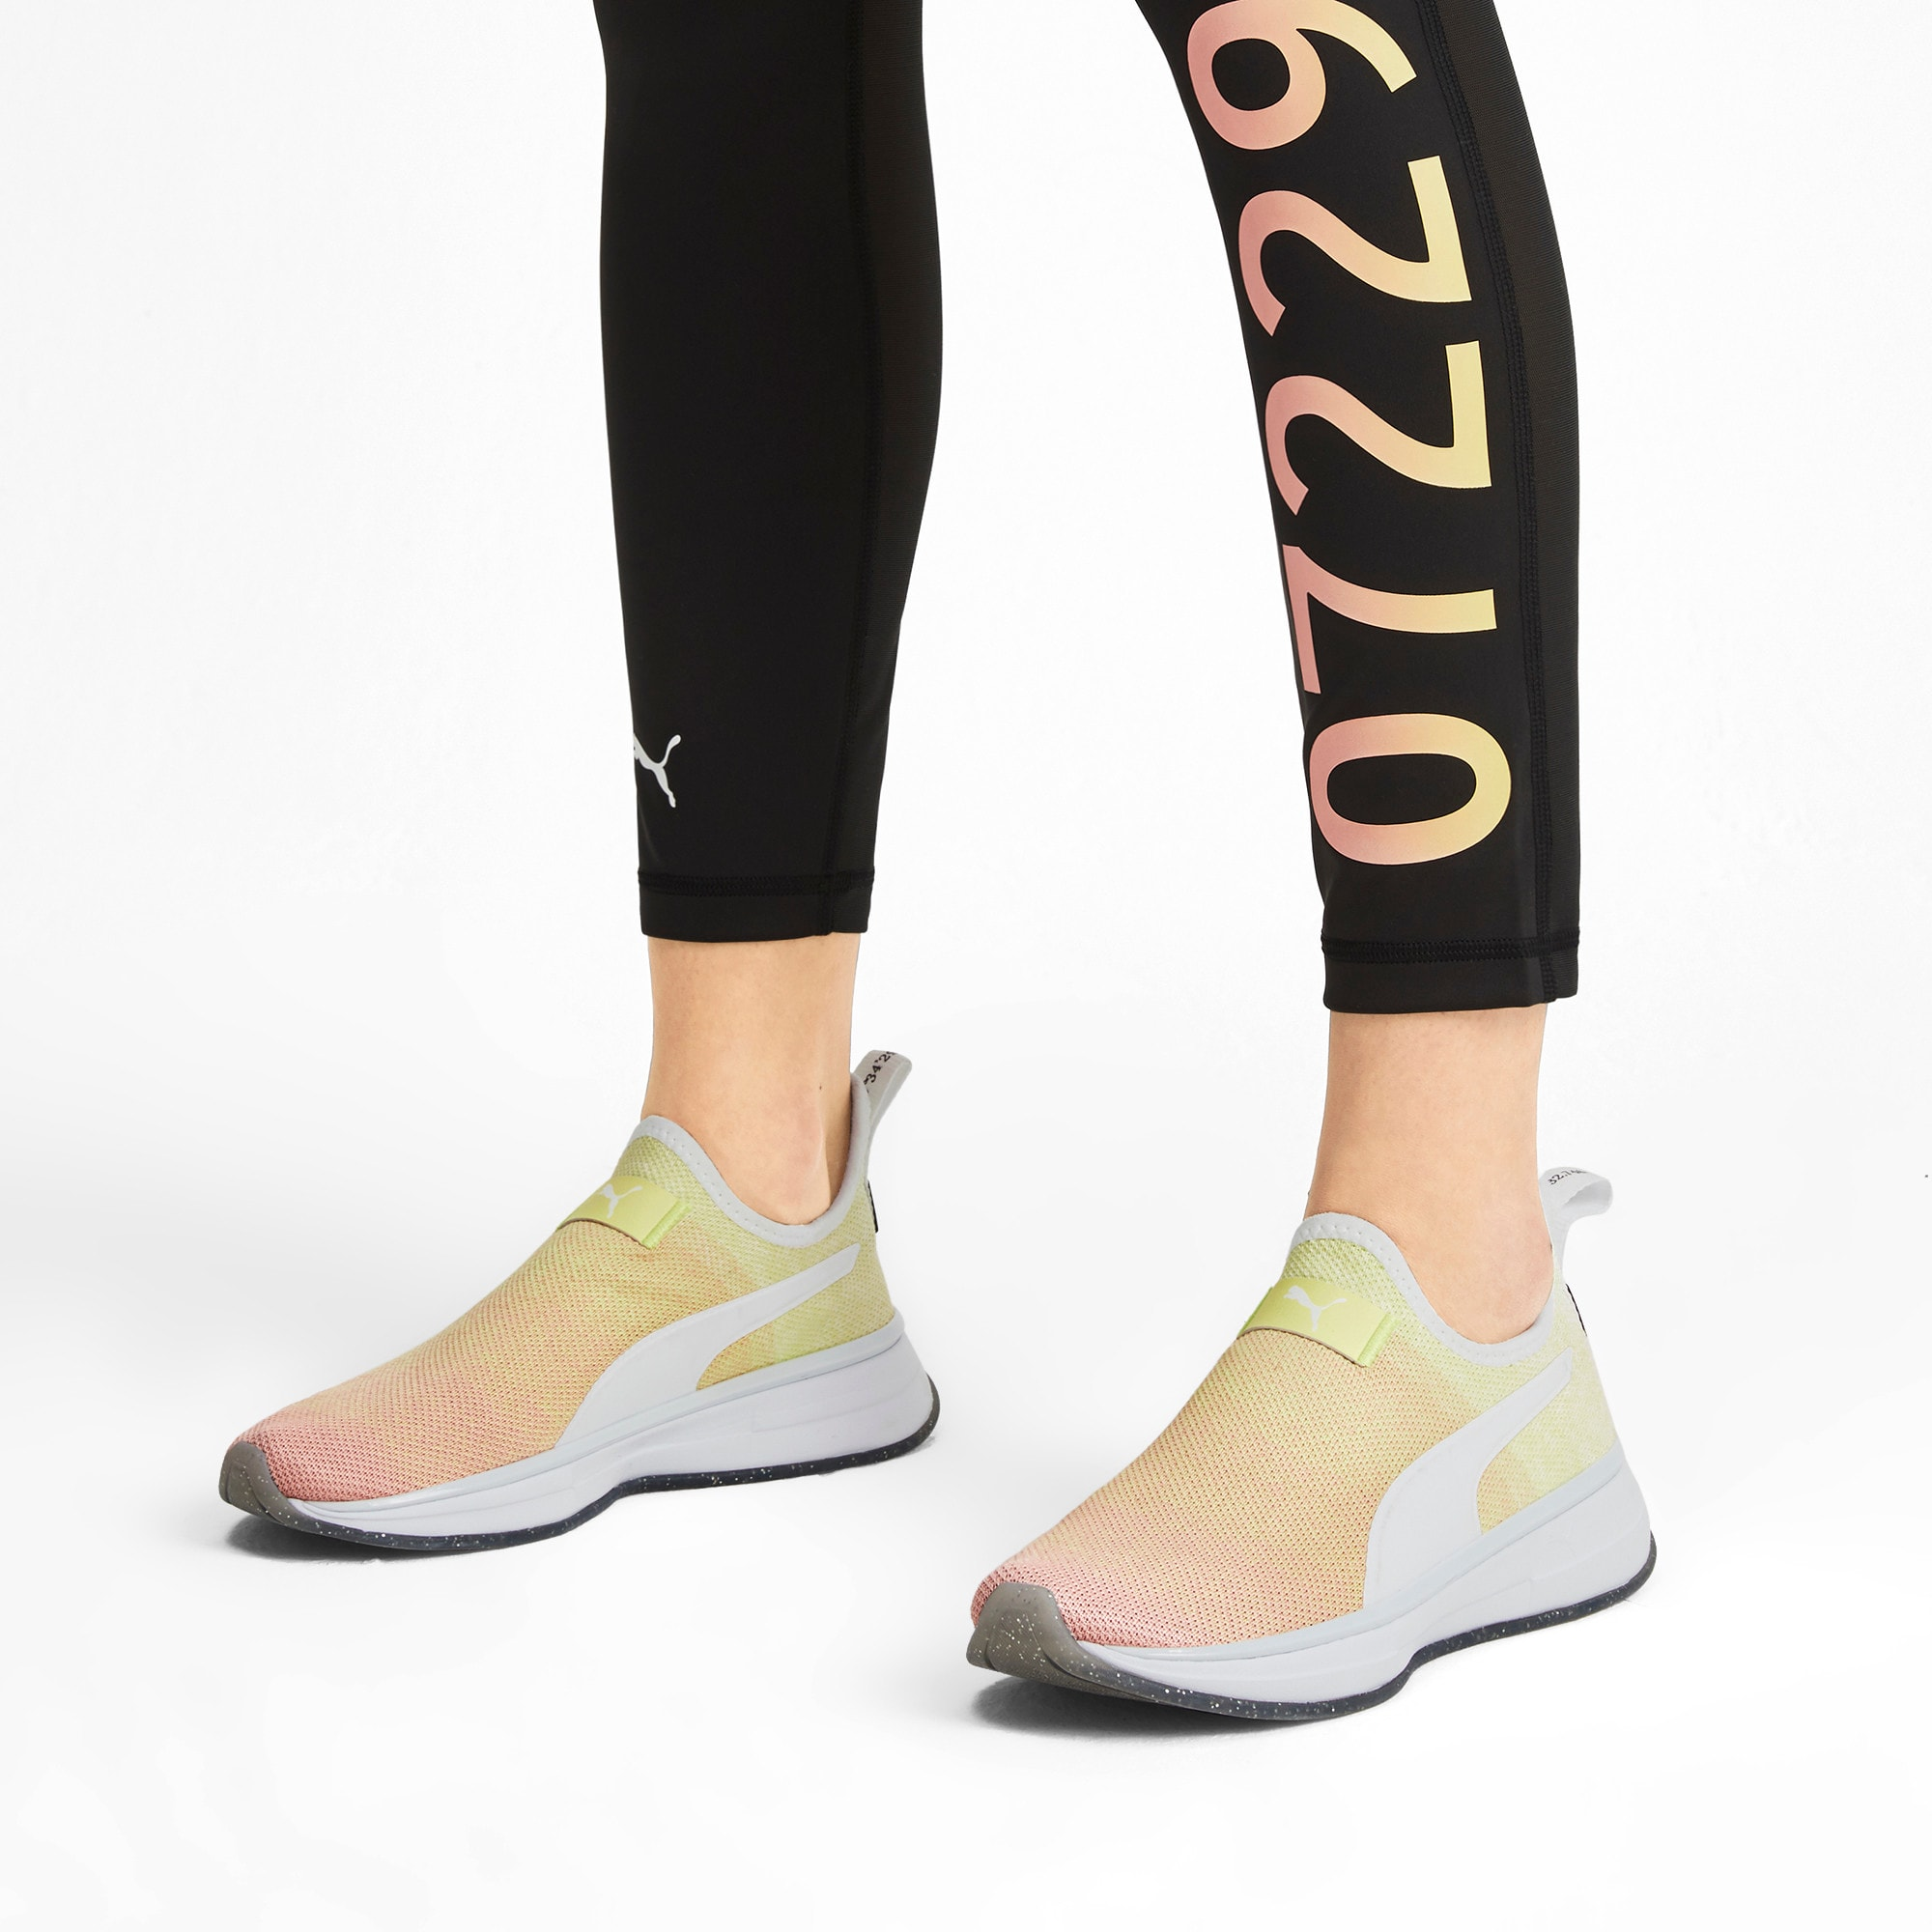 Miniatura 2 de Zapatos de entrenamiento SG Slip-On Sunrise para mujer, YELLOW-Peach Bud-White, mediano